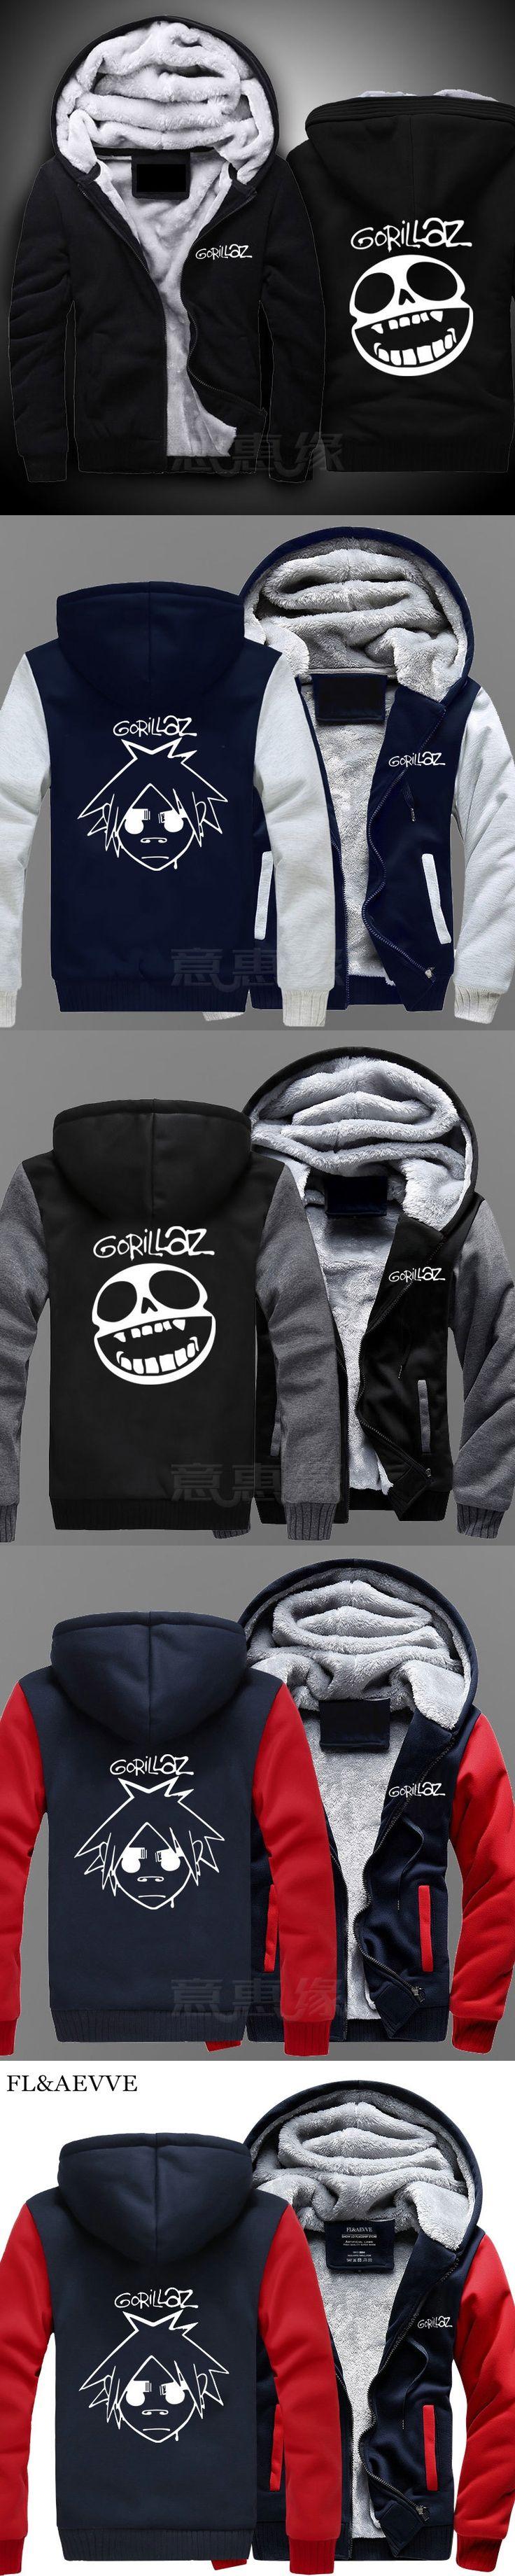 FL&AEVVE Winter Jackets And Coats Gorillaz Band Cotton Hoodie casual Hooded Thick Zipper Men Sweatshirt Autumn Long Sleeve